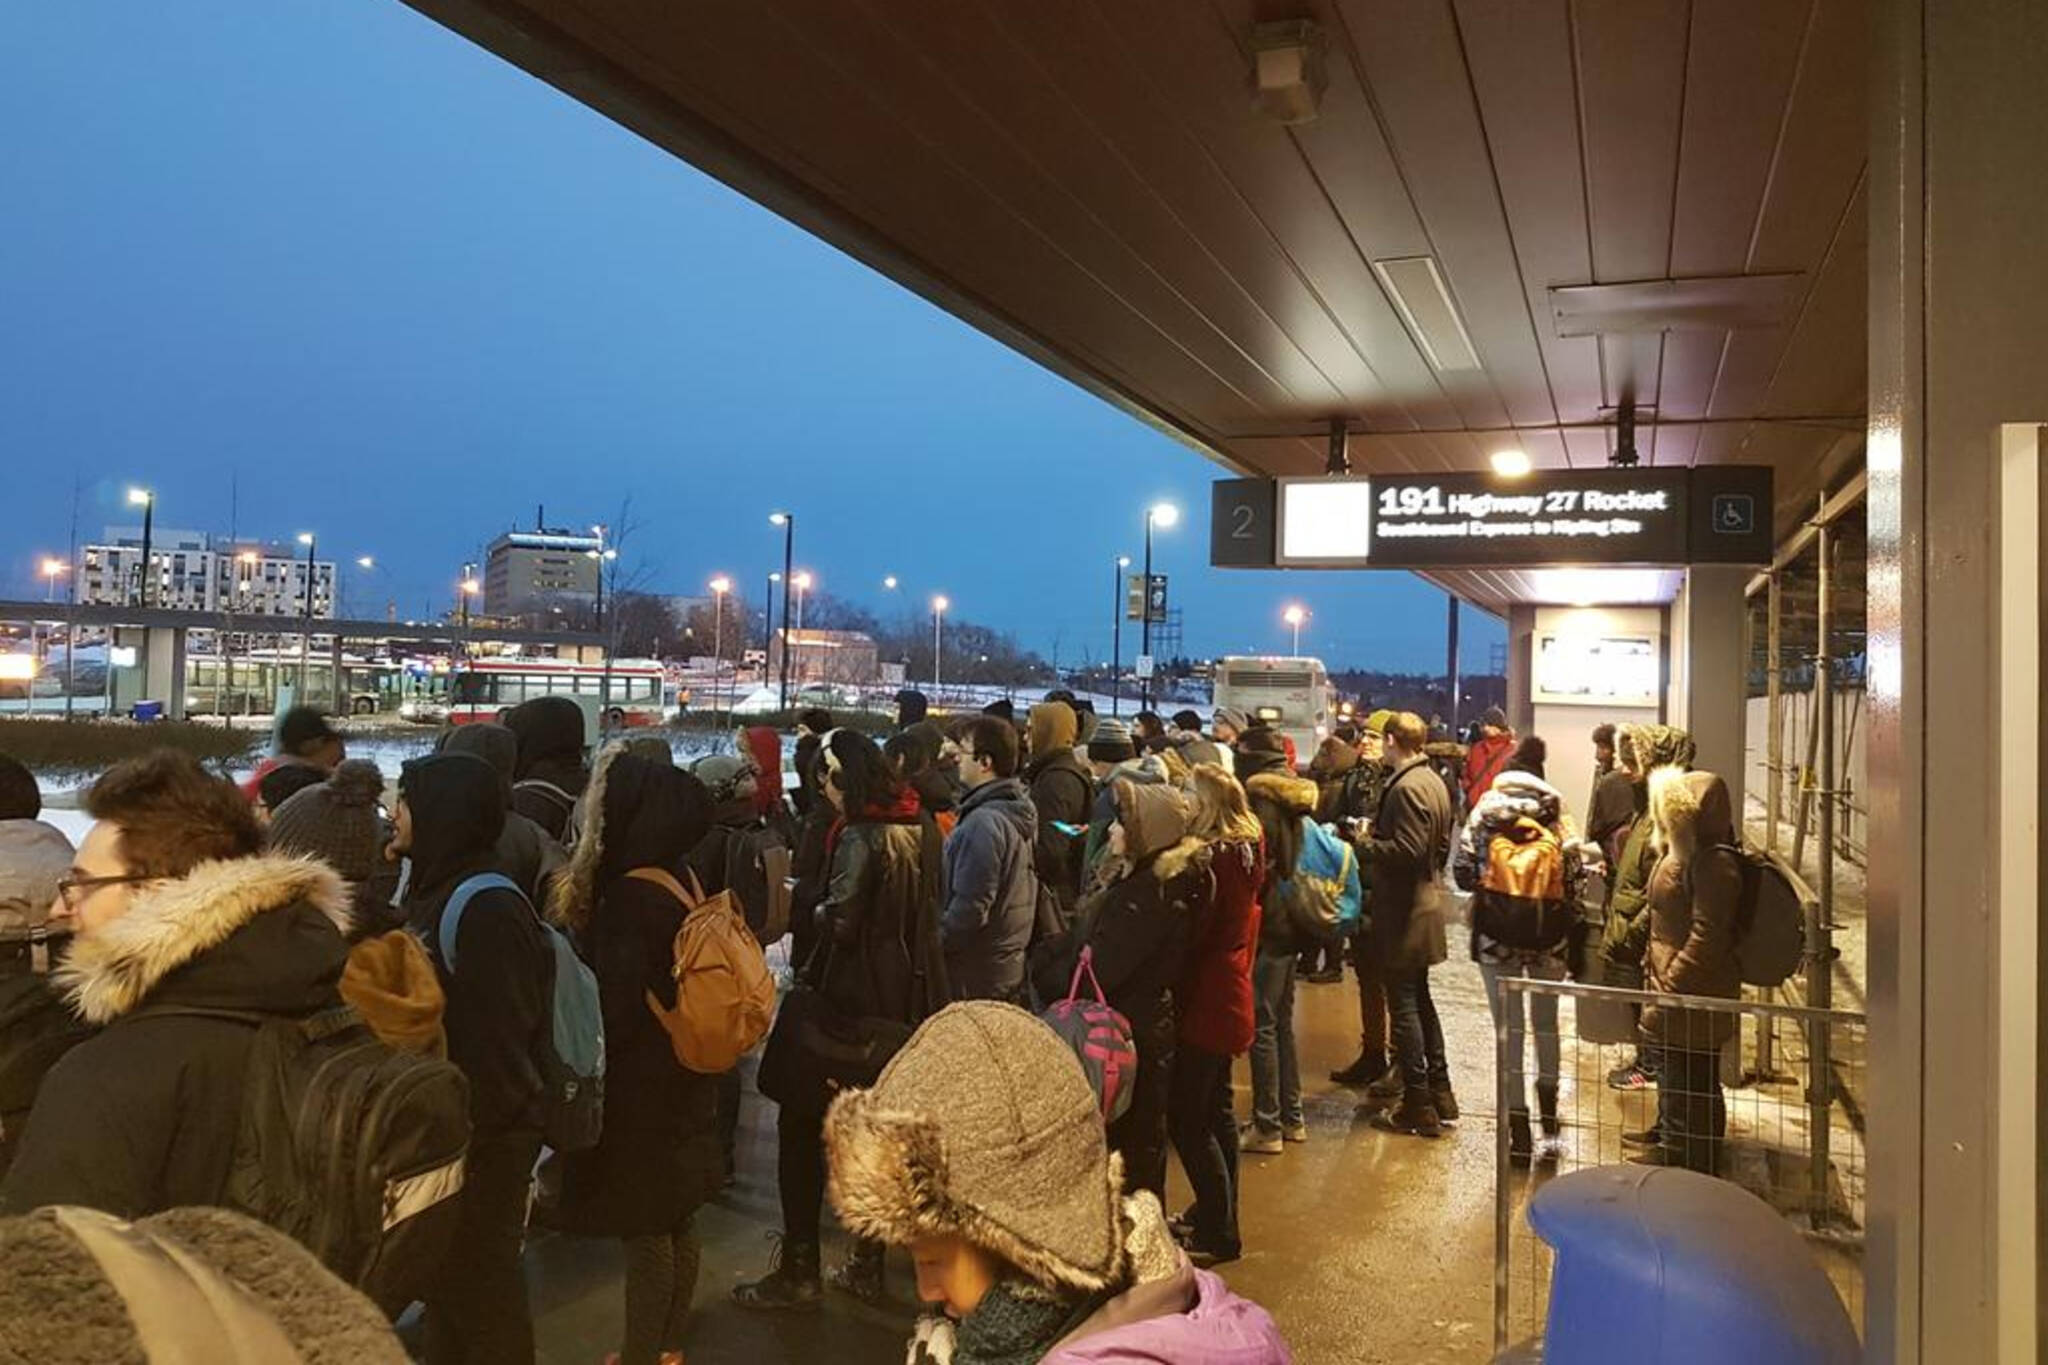 toronto transit delays